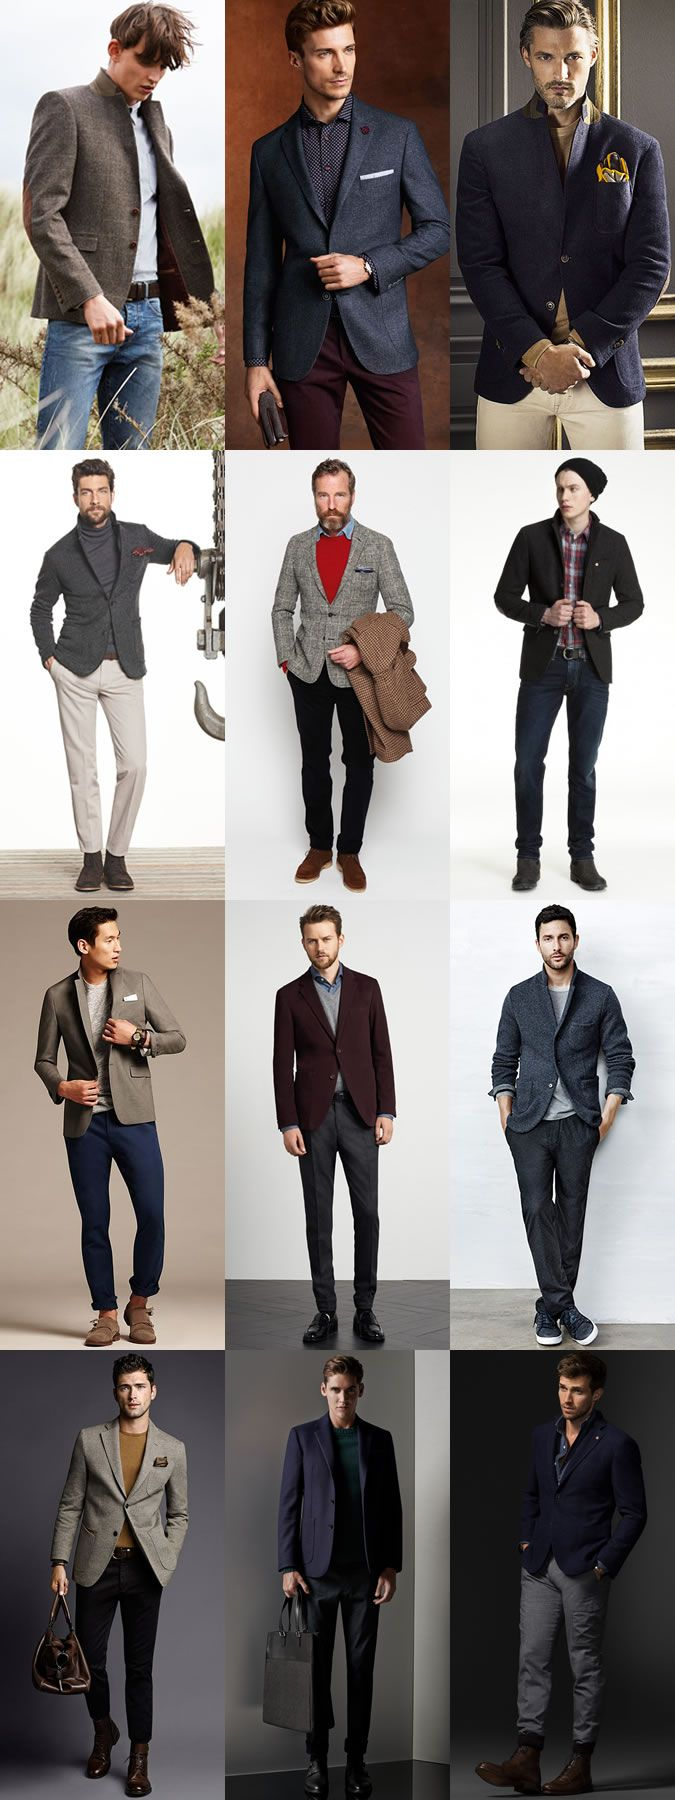 Men's Transitional Jackets For Autumn 2014: Textured Blazers For Autumn Lookbook Inspiration